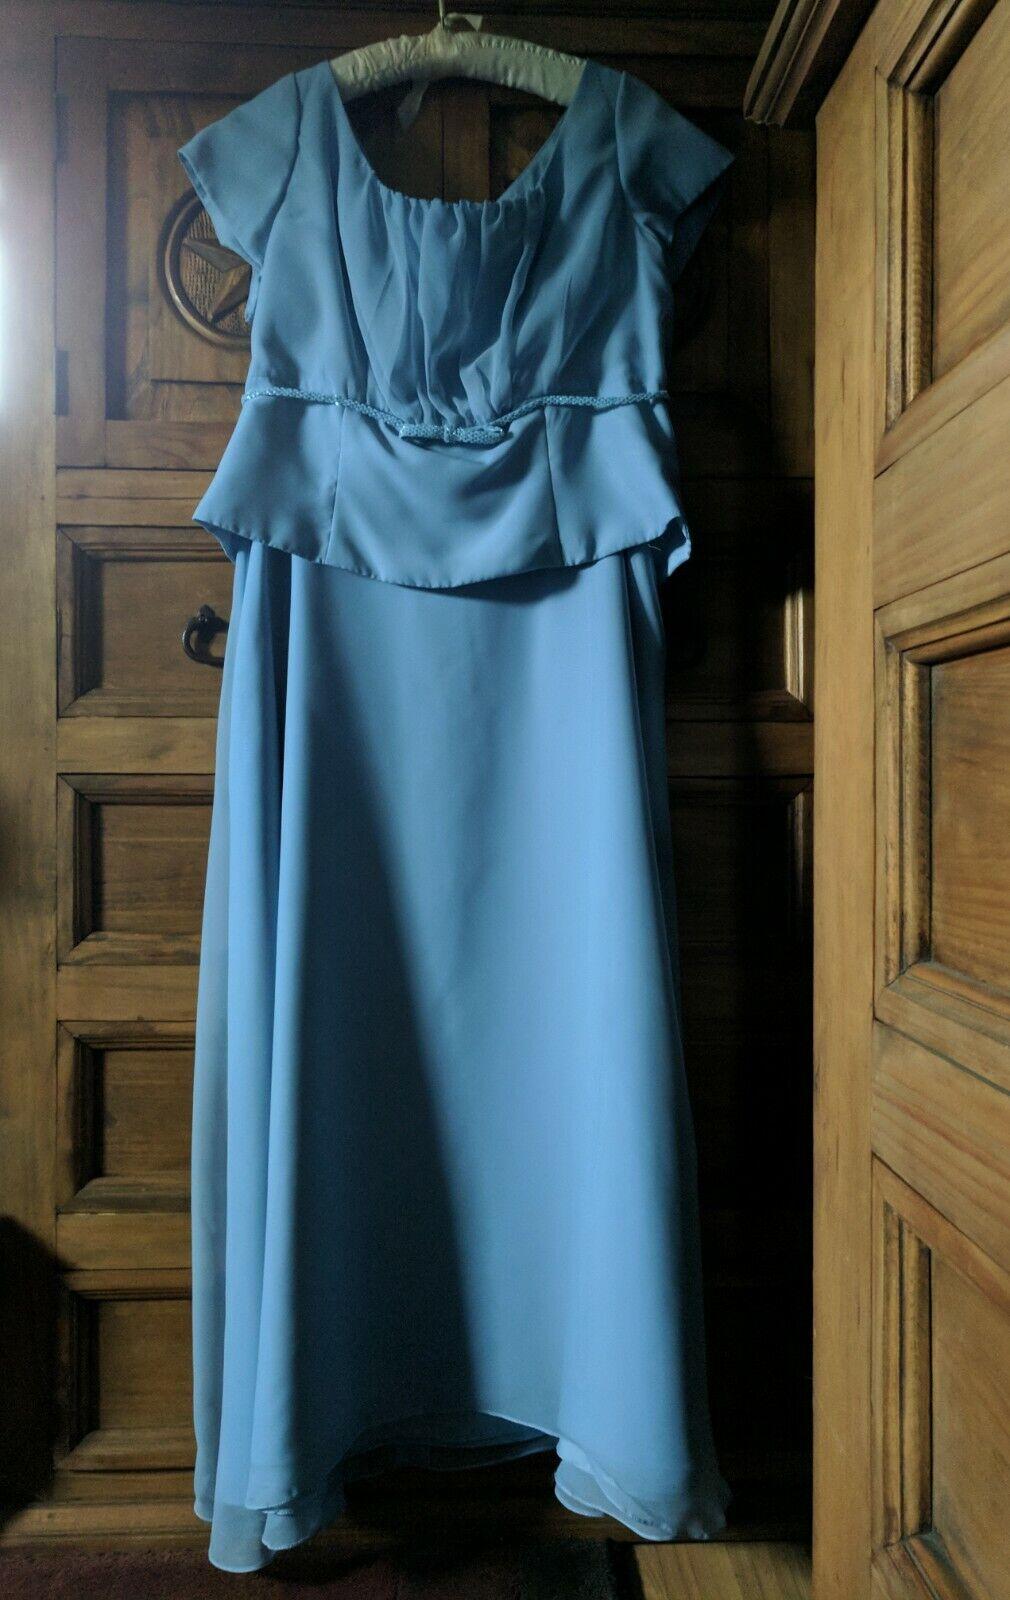 Eden Bridals Mother of the Bride Long Skirt & Top Asymmetrical Hem Size 18 Blue